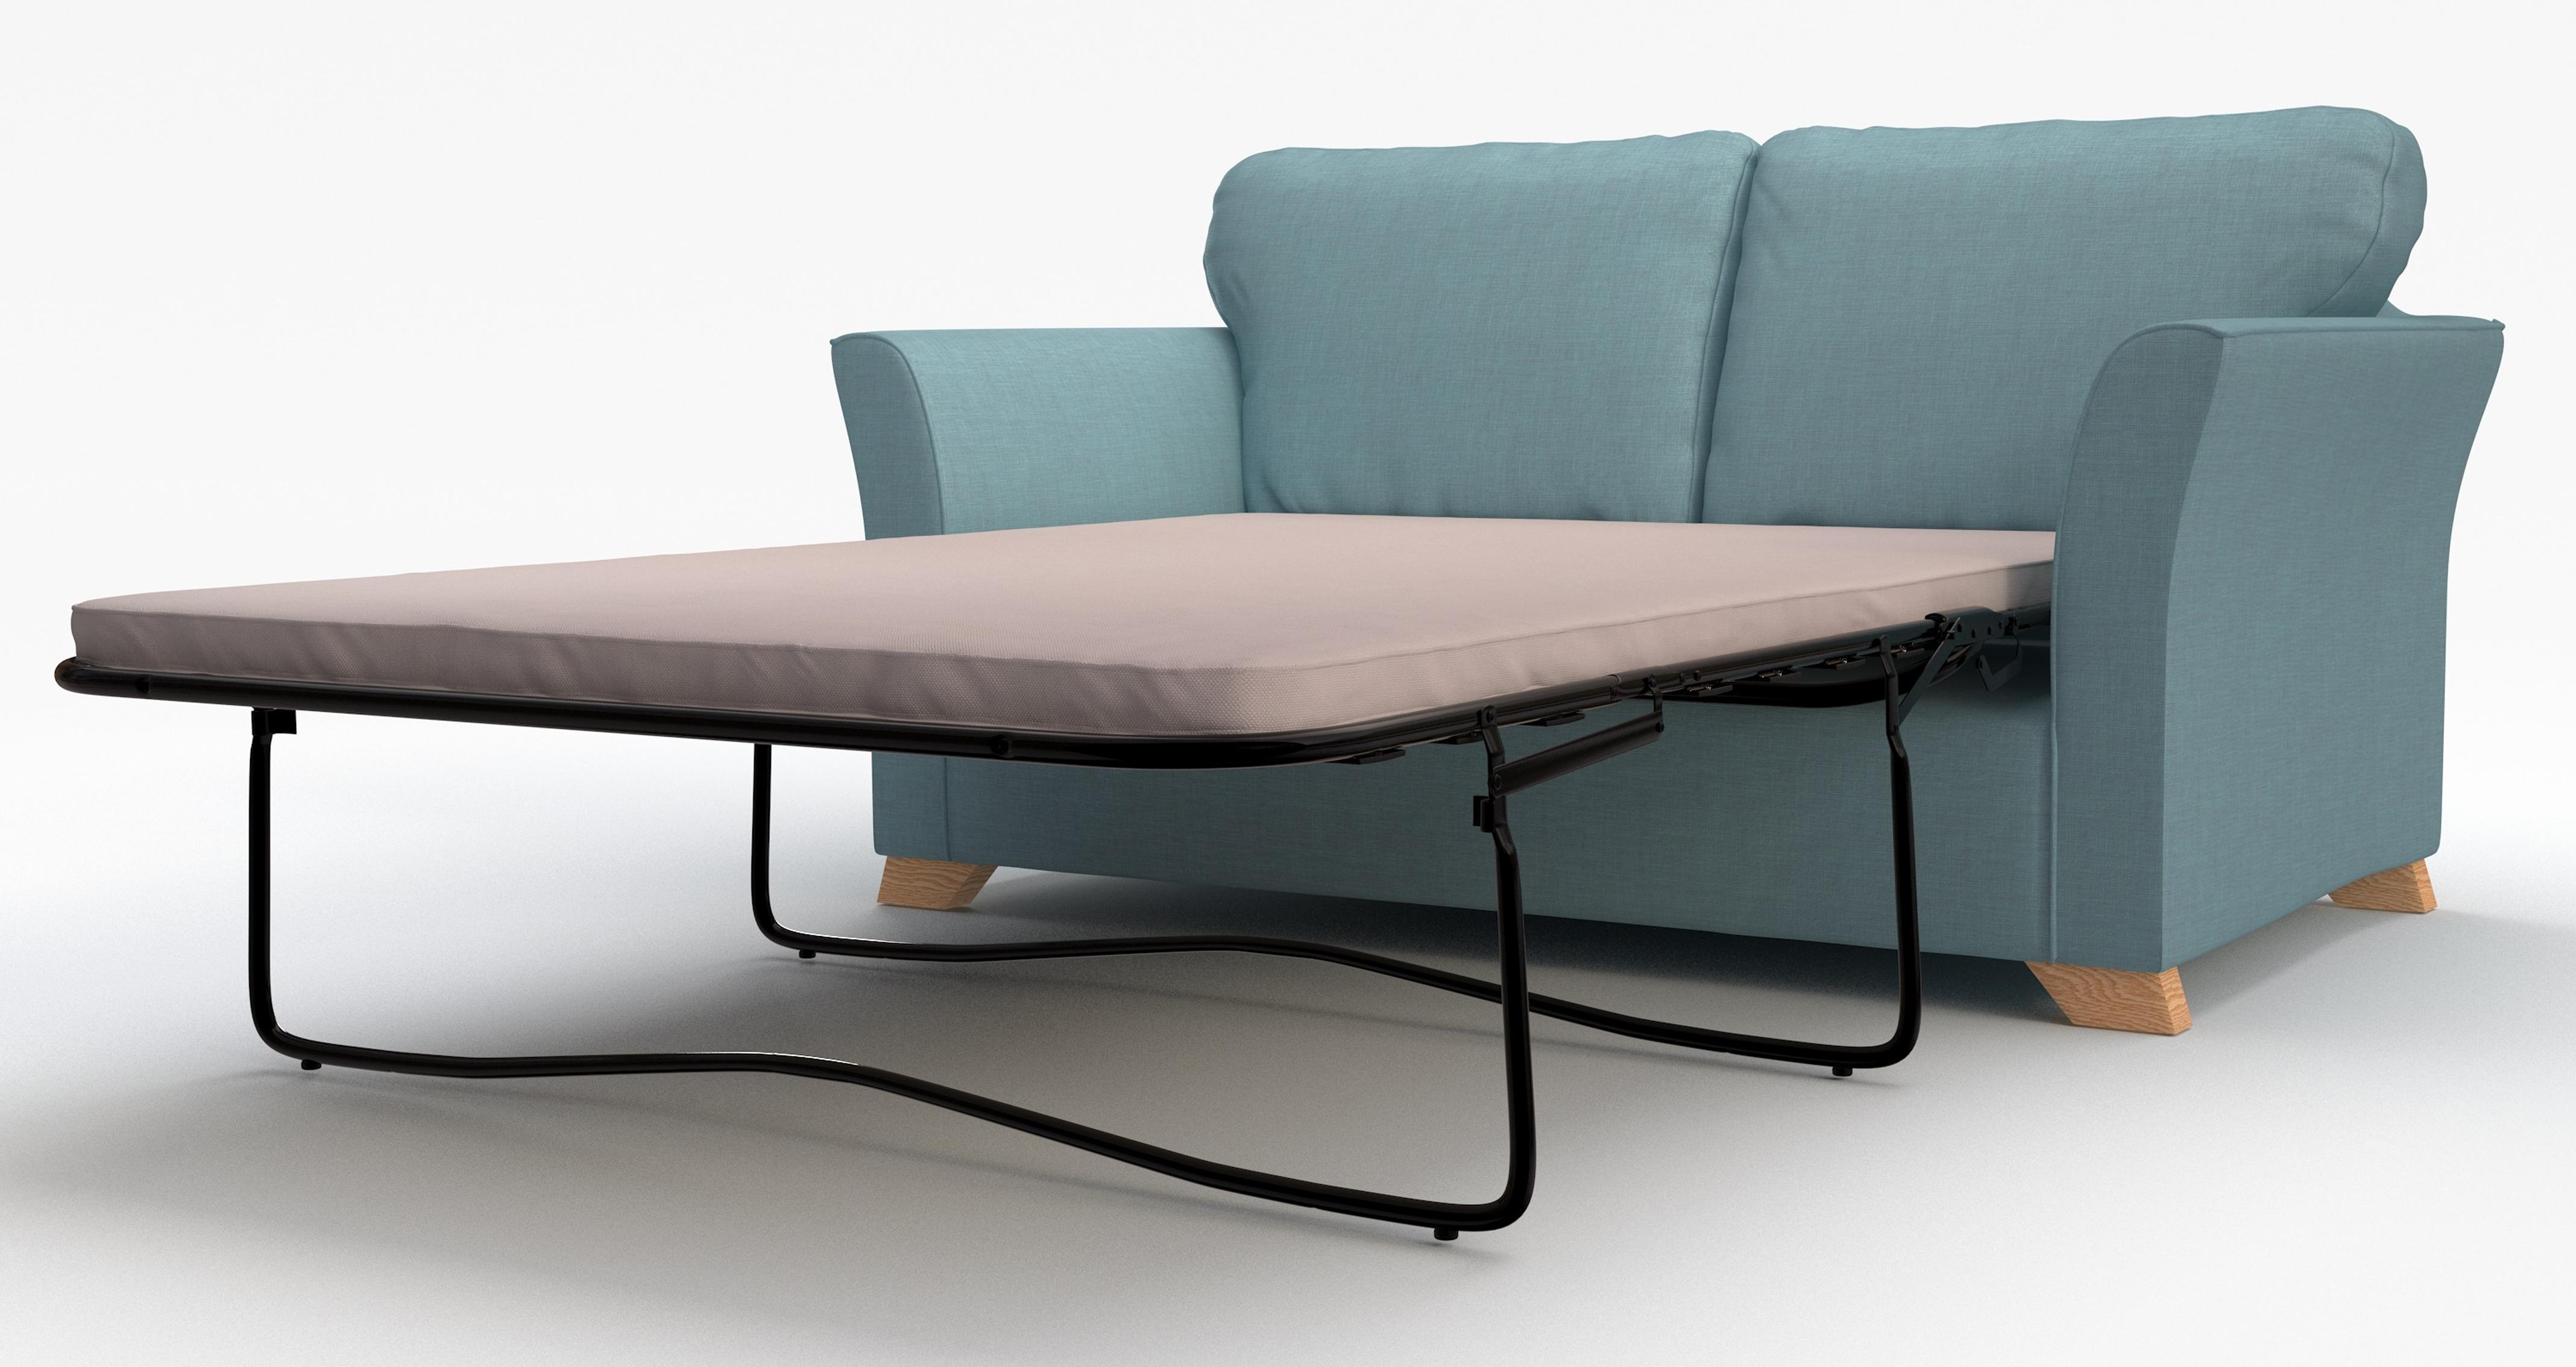 DFS Zuma Fabric Range - 3 Seater, 2 Str, Sofa Bed, Armchair or Stool